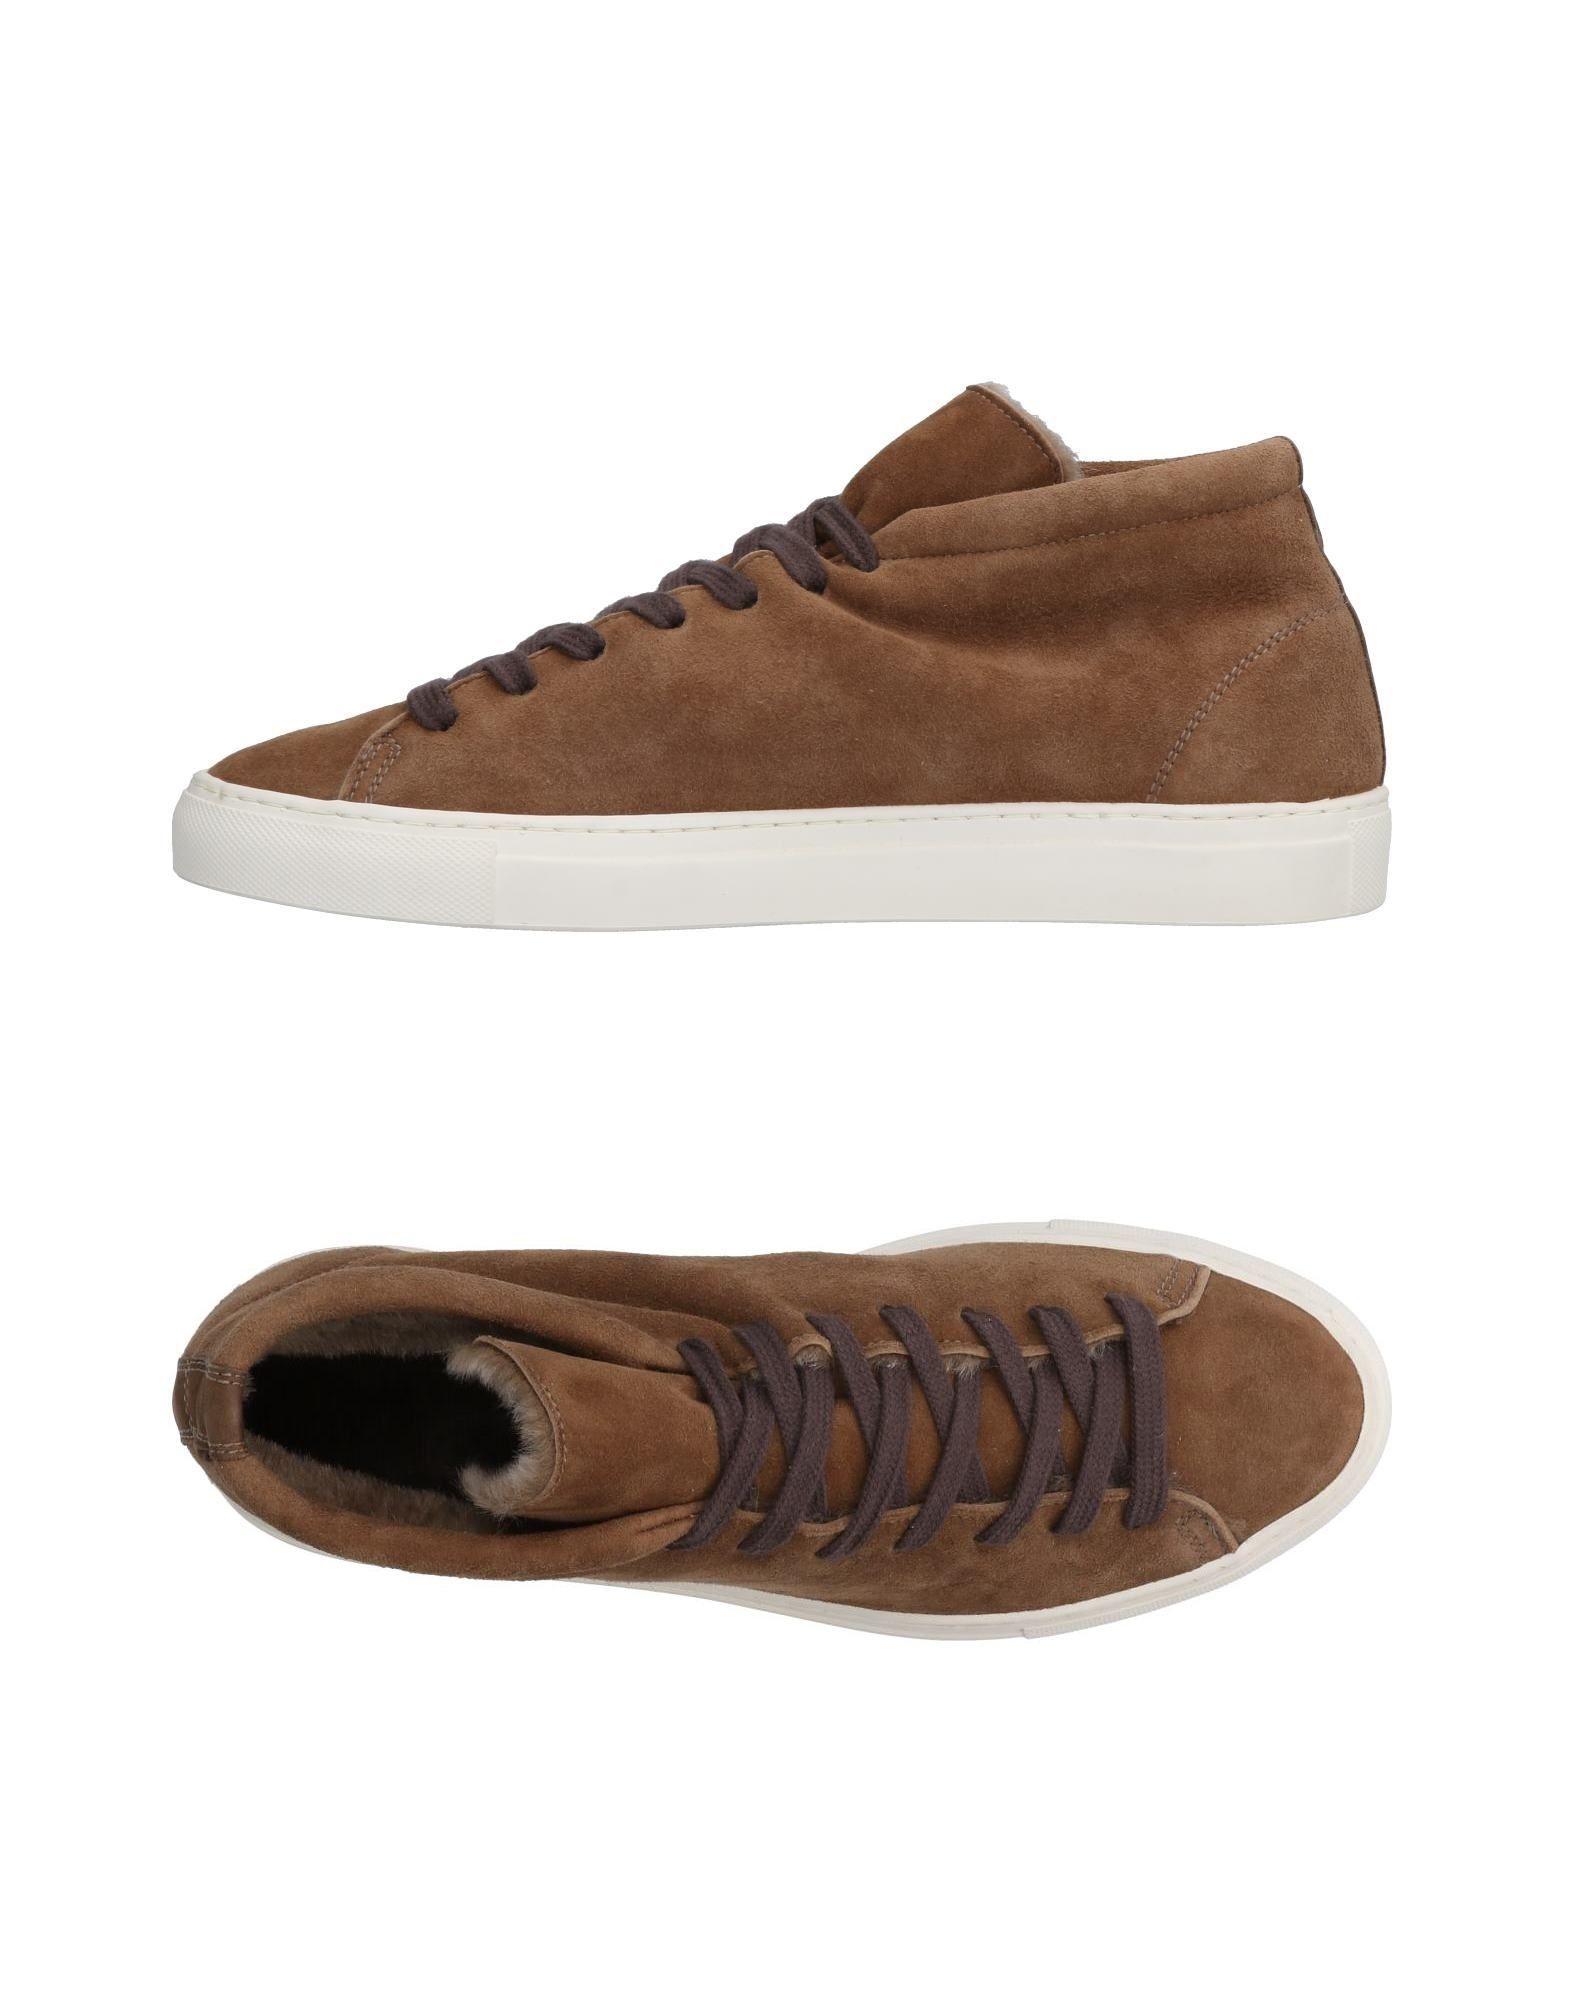 Diemme Sneakers Herren  11507334UE Gute Qualität beliebte Schuhe